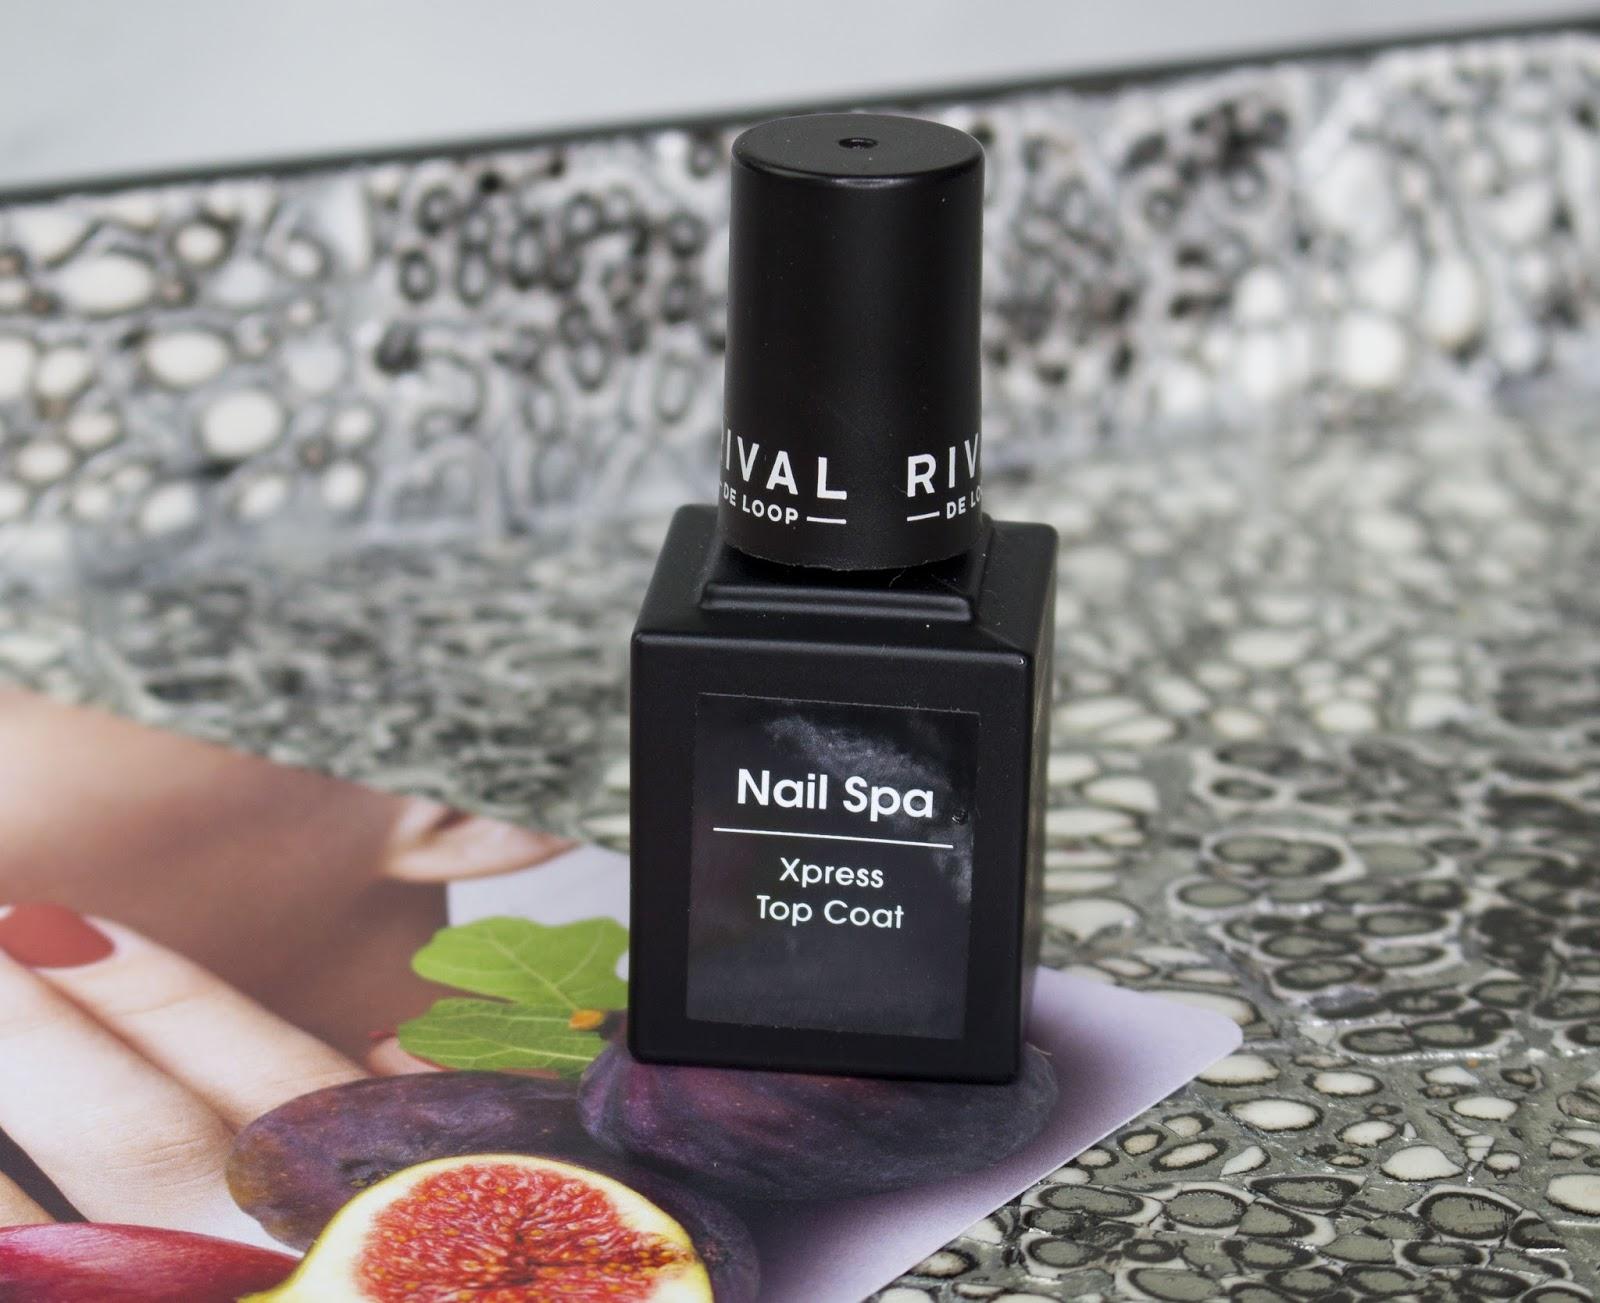 Rival de Loop // Nail Spa LE - Beautyinspiration